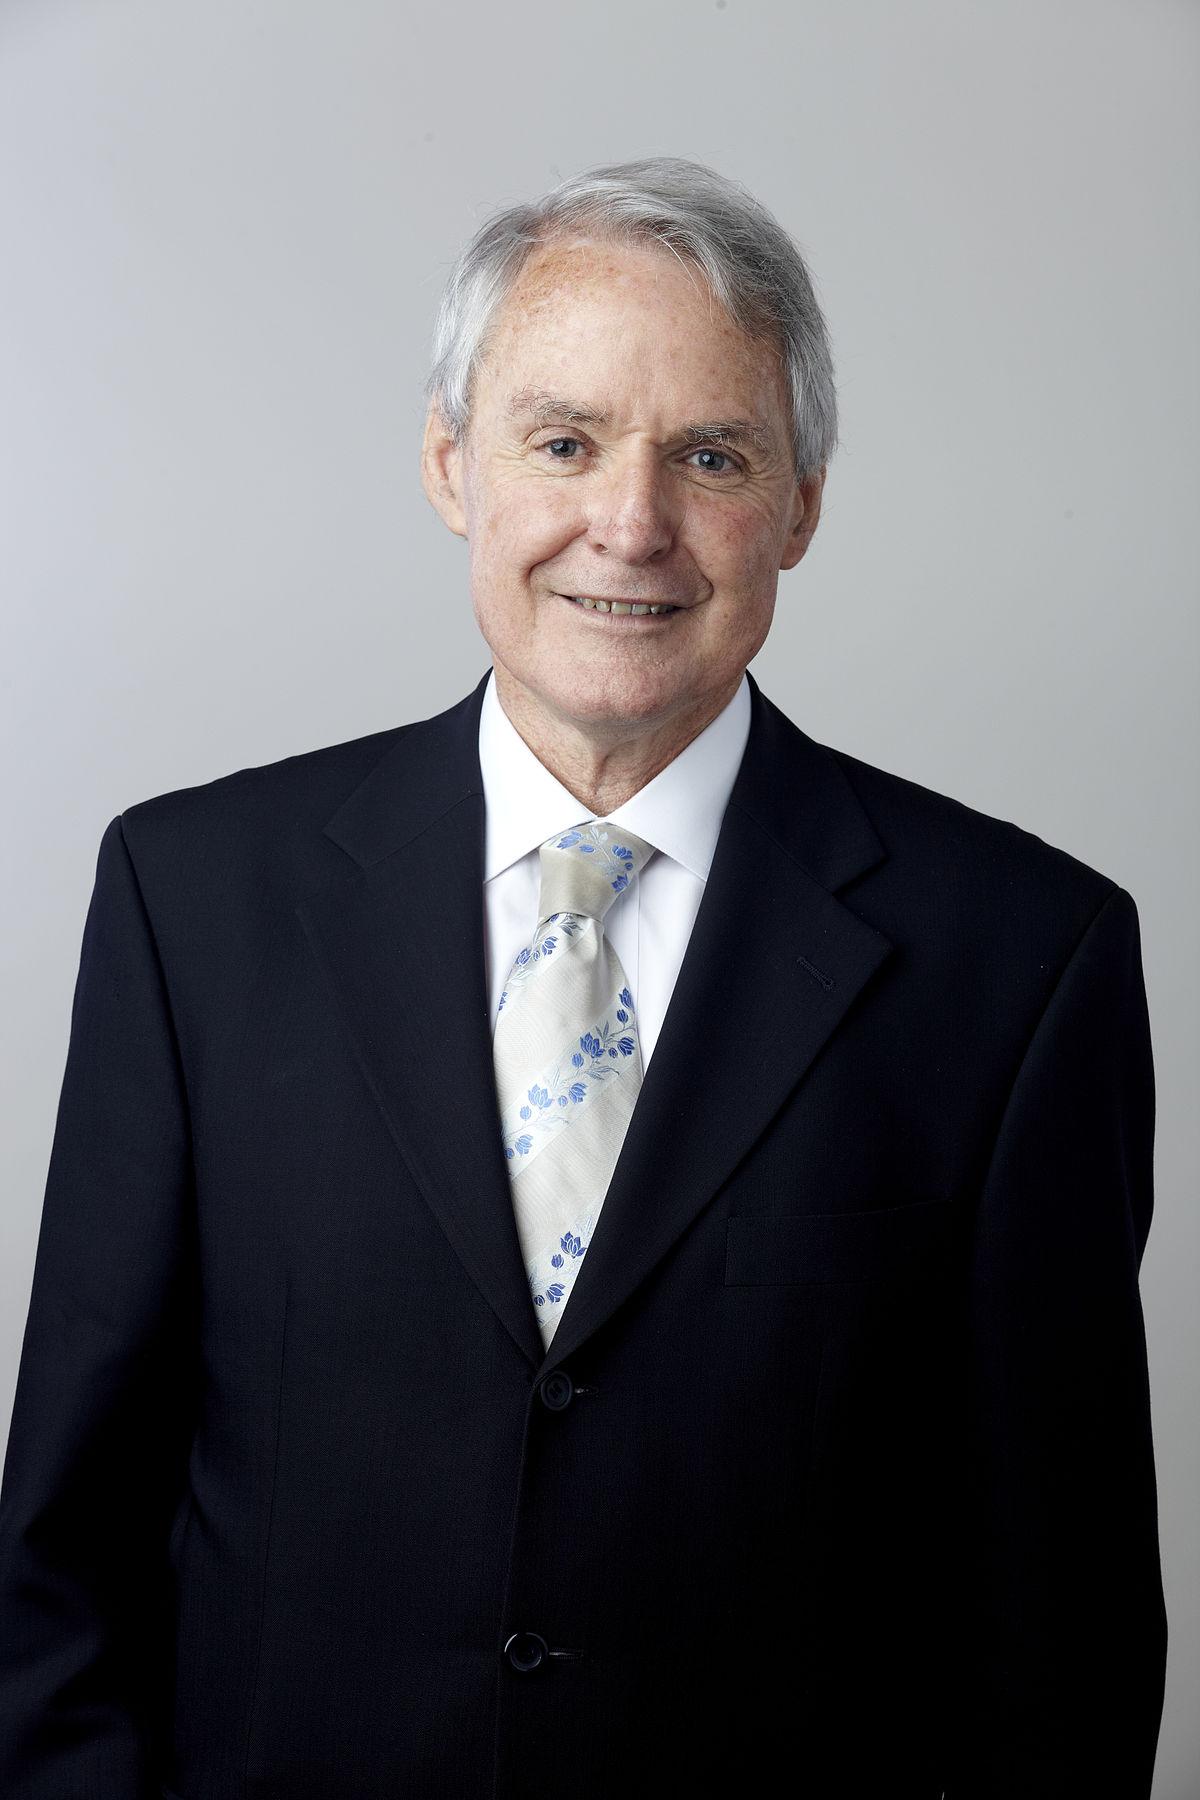 physics sydney university ifrs 7 wiki